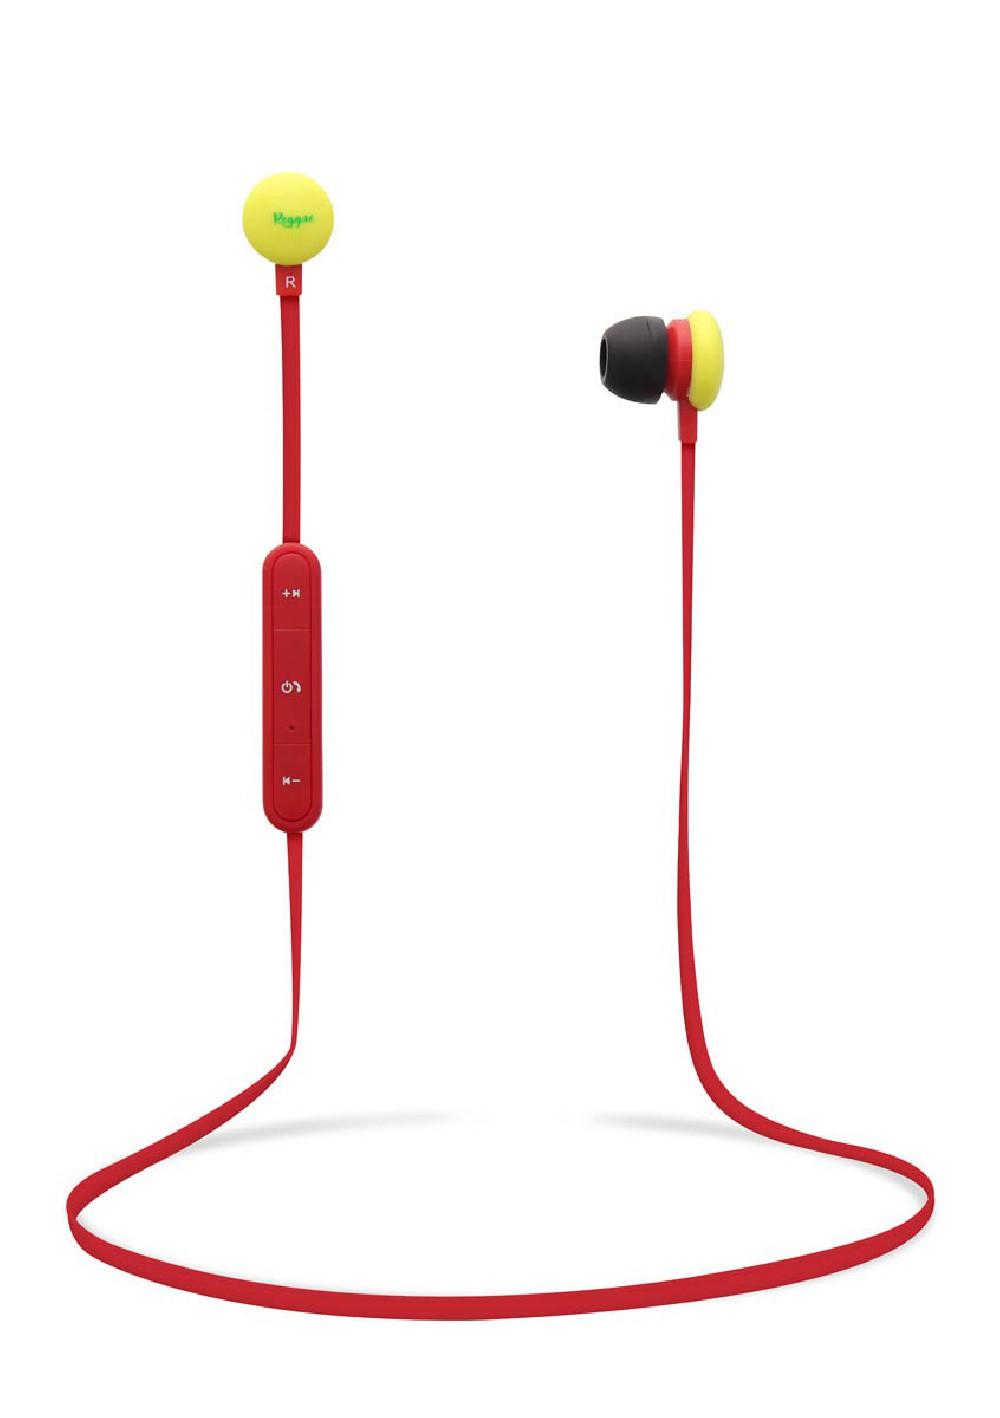 TREND REGGAE BLUETOOTH EARPHONES